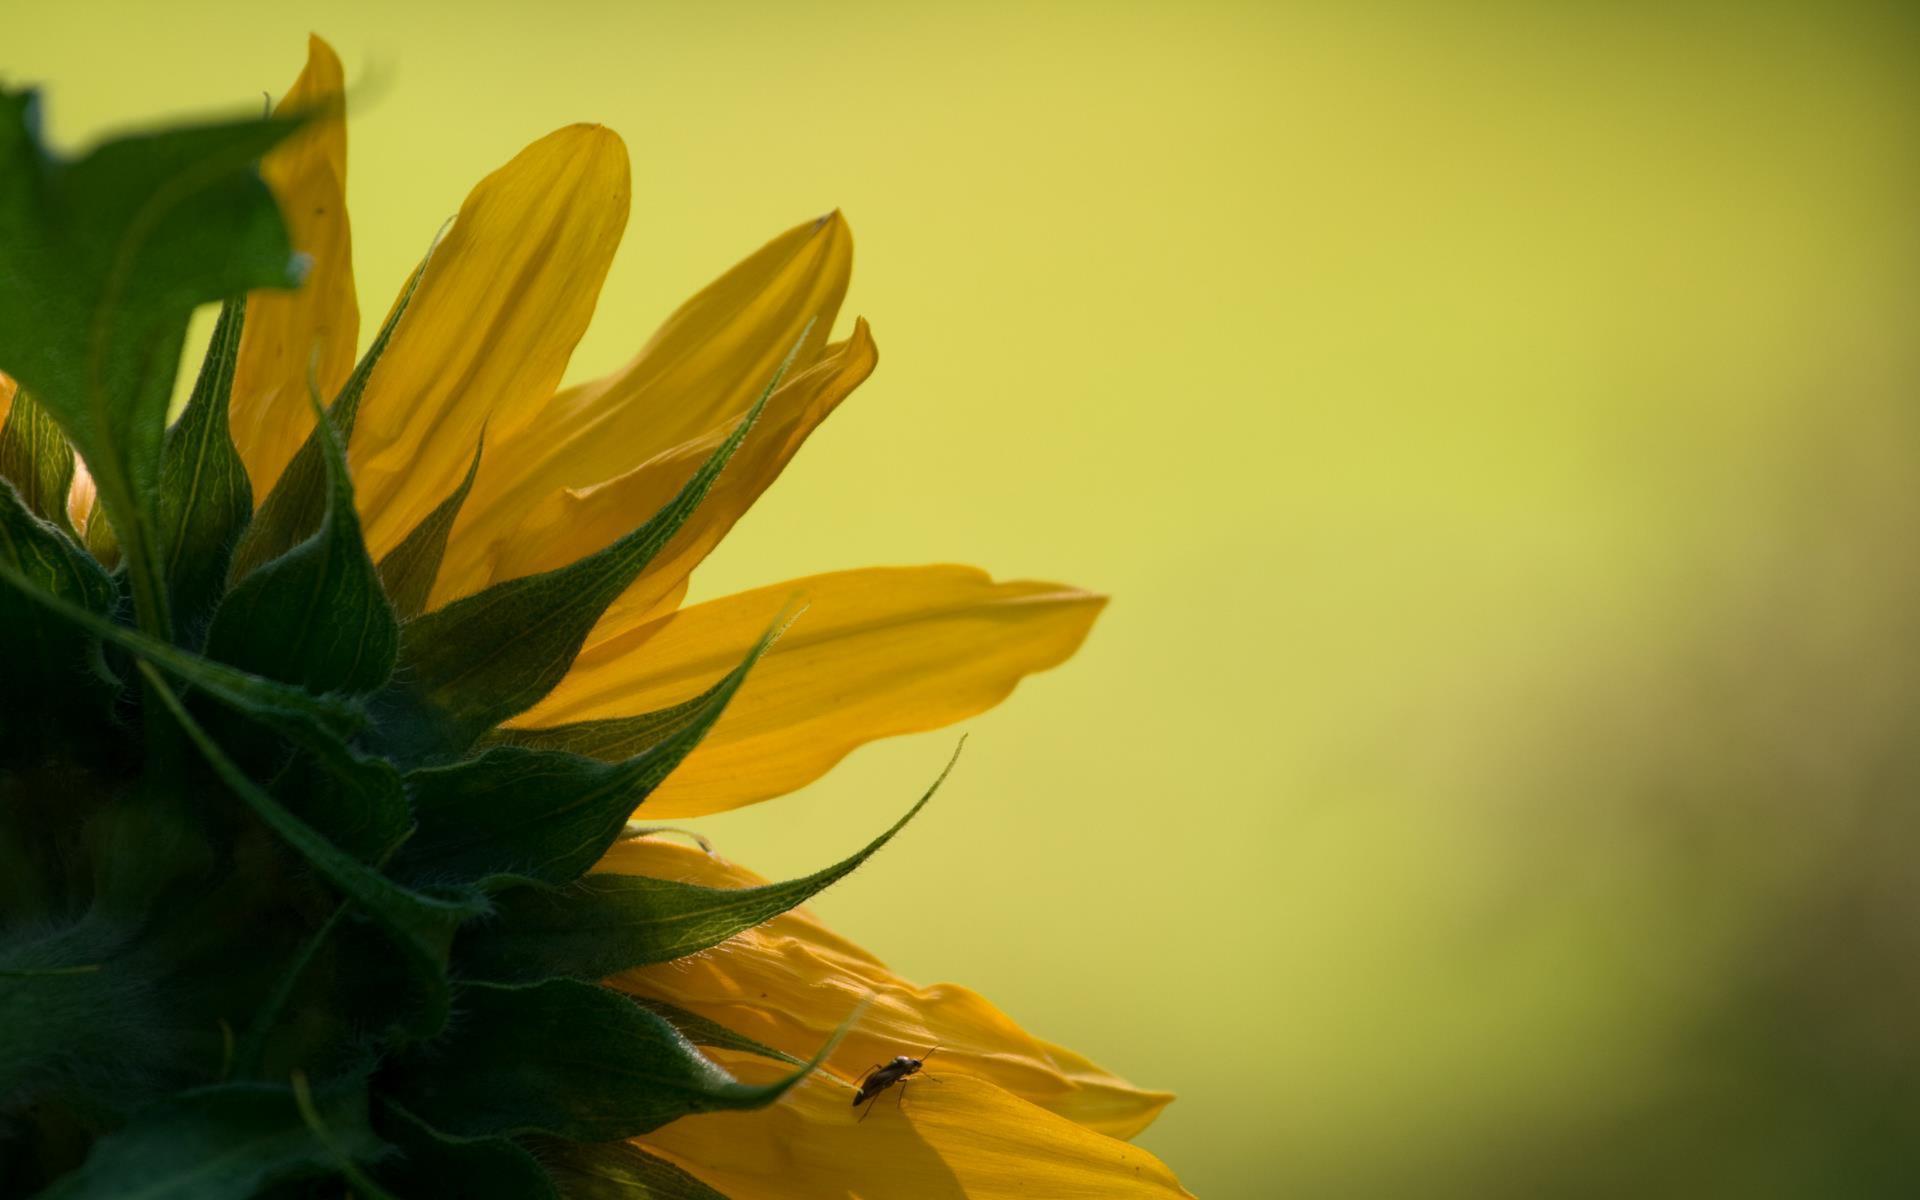 fleurs-en-fonds-ecran-HD-a-telecharger-gratuitement_1